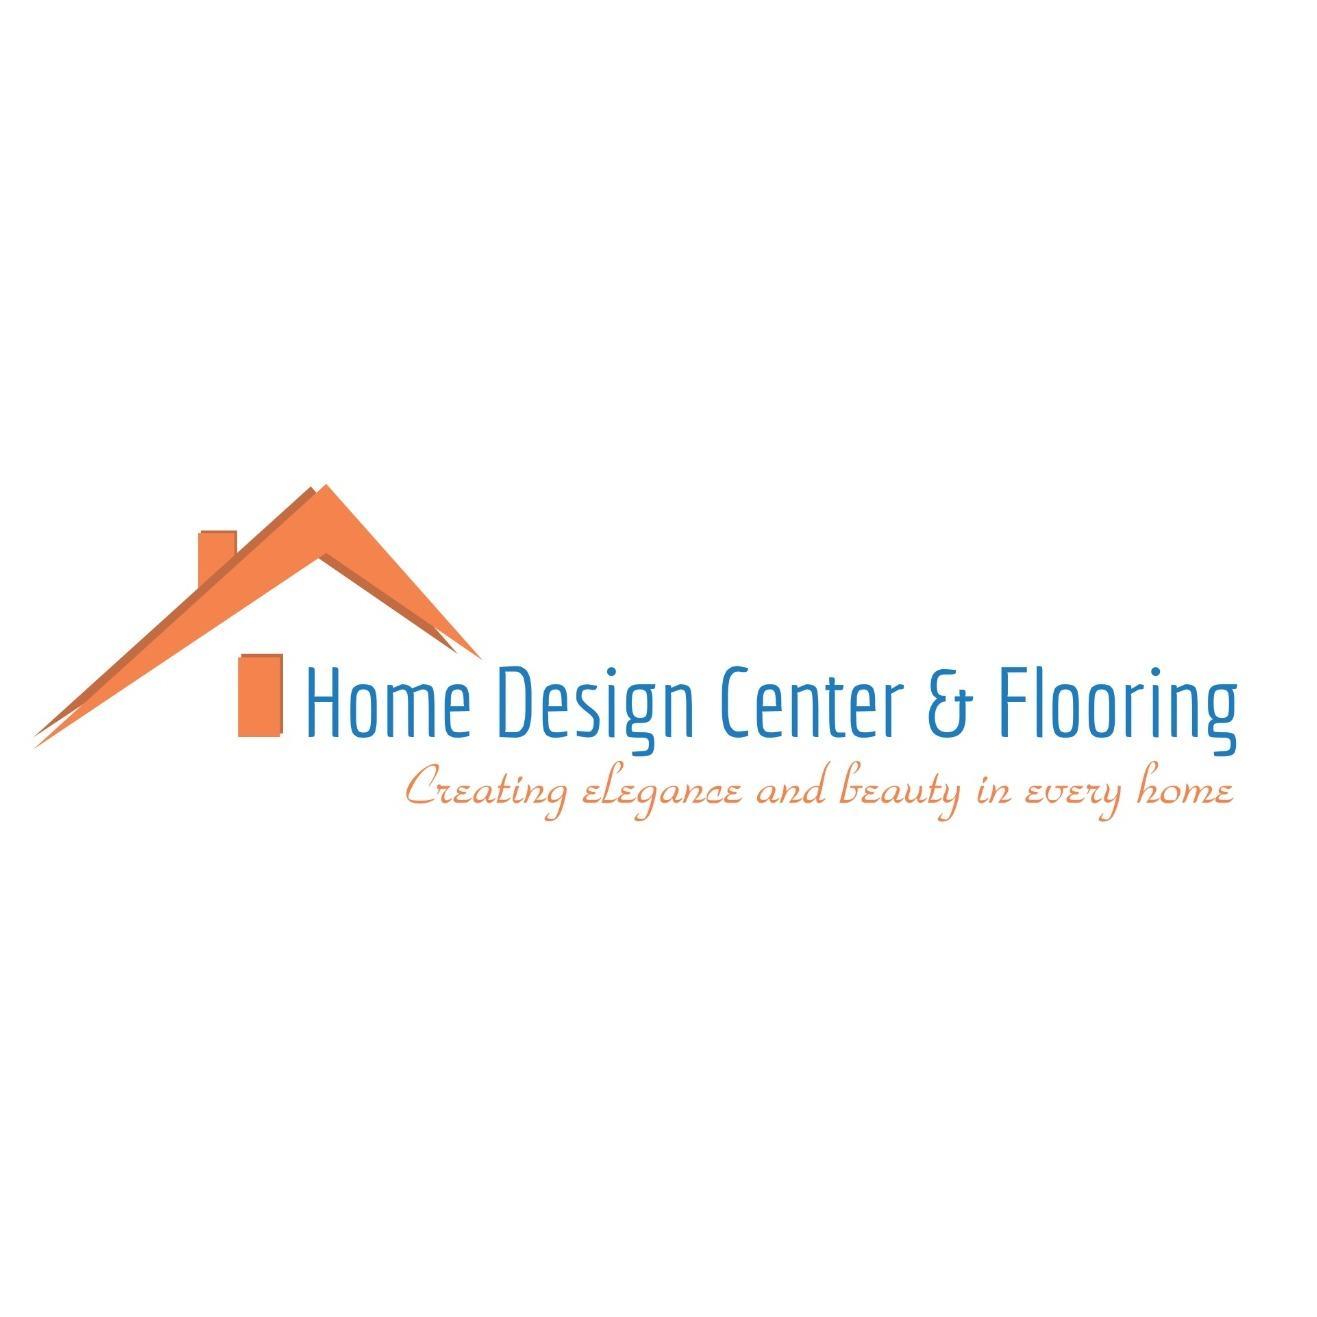 Home Design Center & Flooring